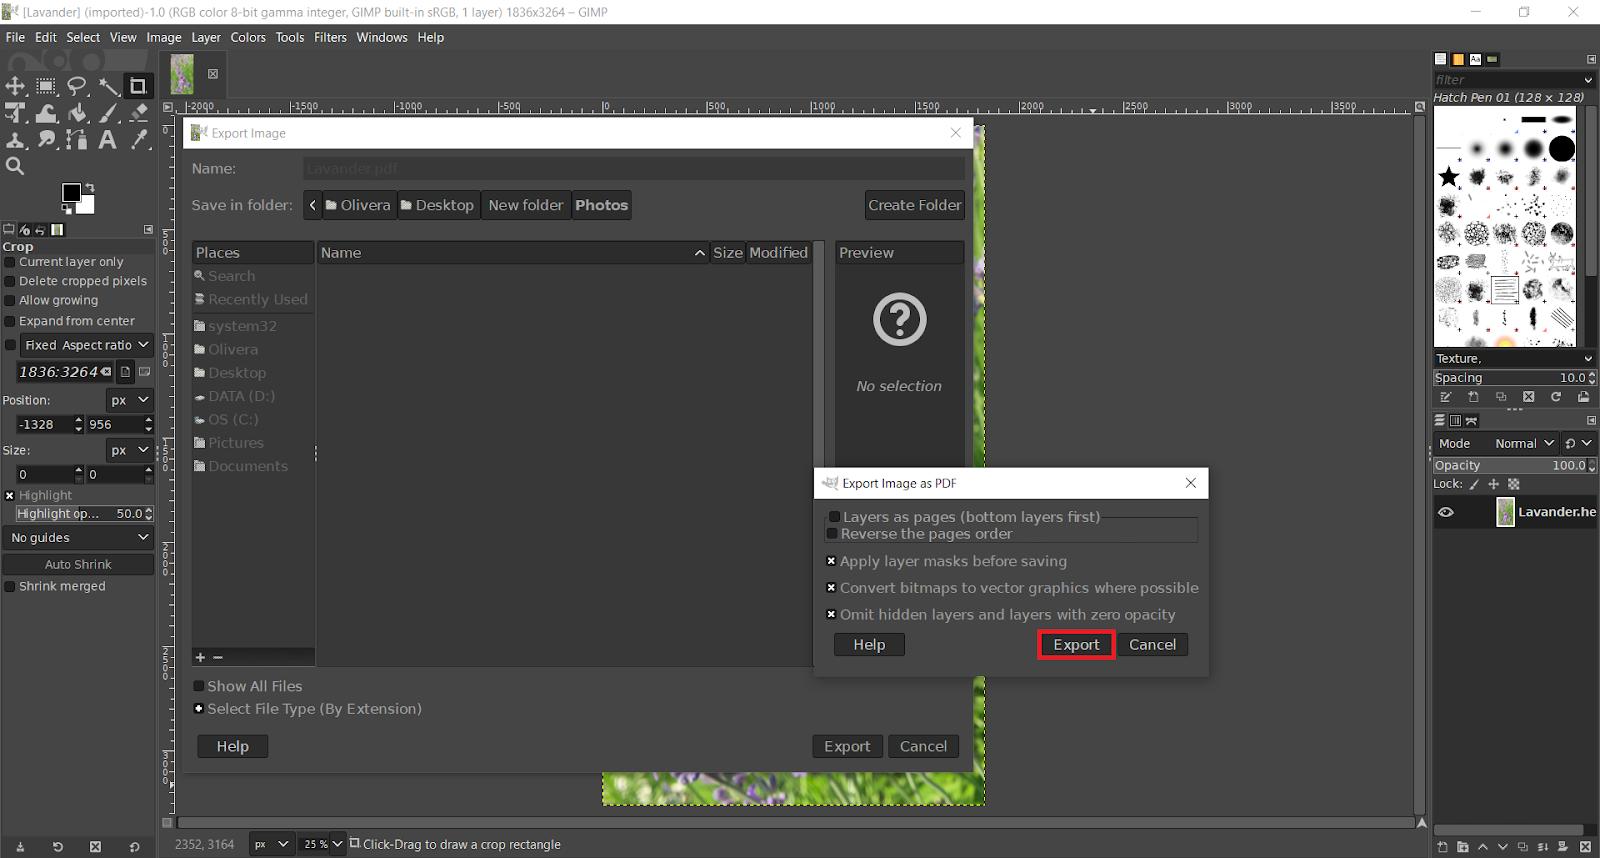 Export Image as PDF